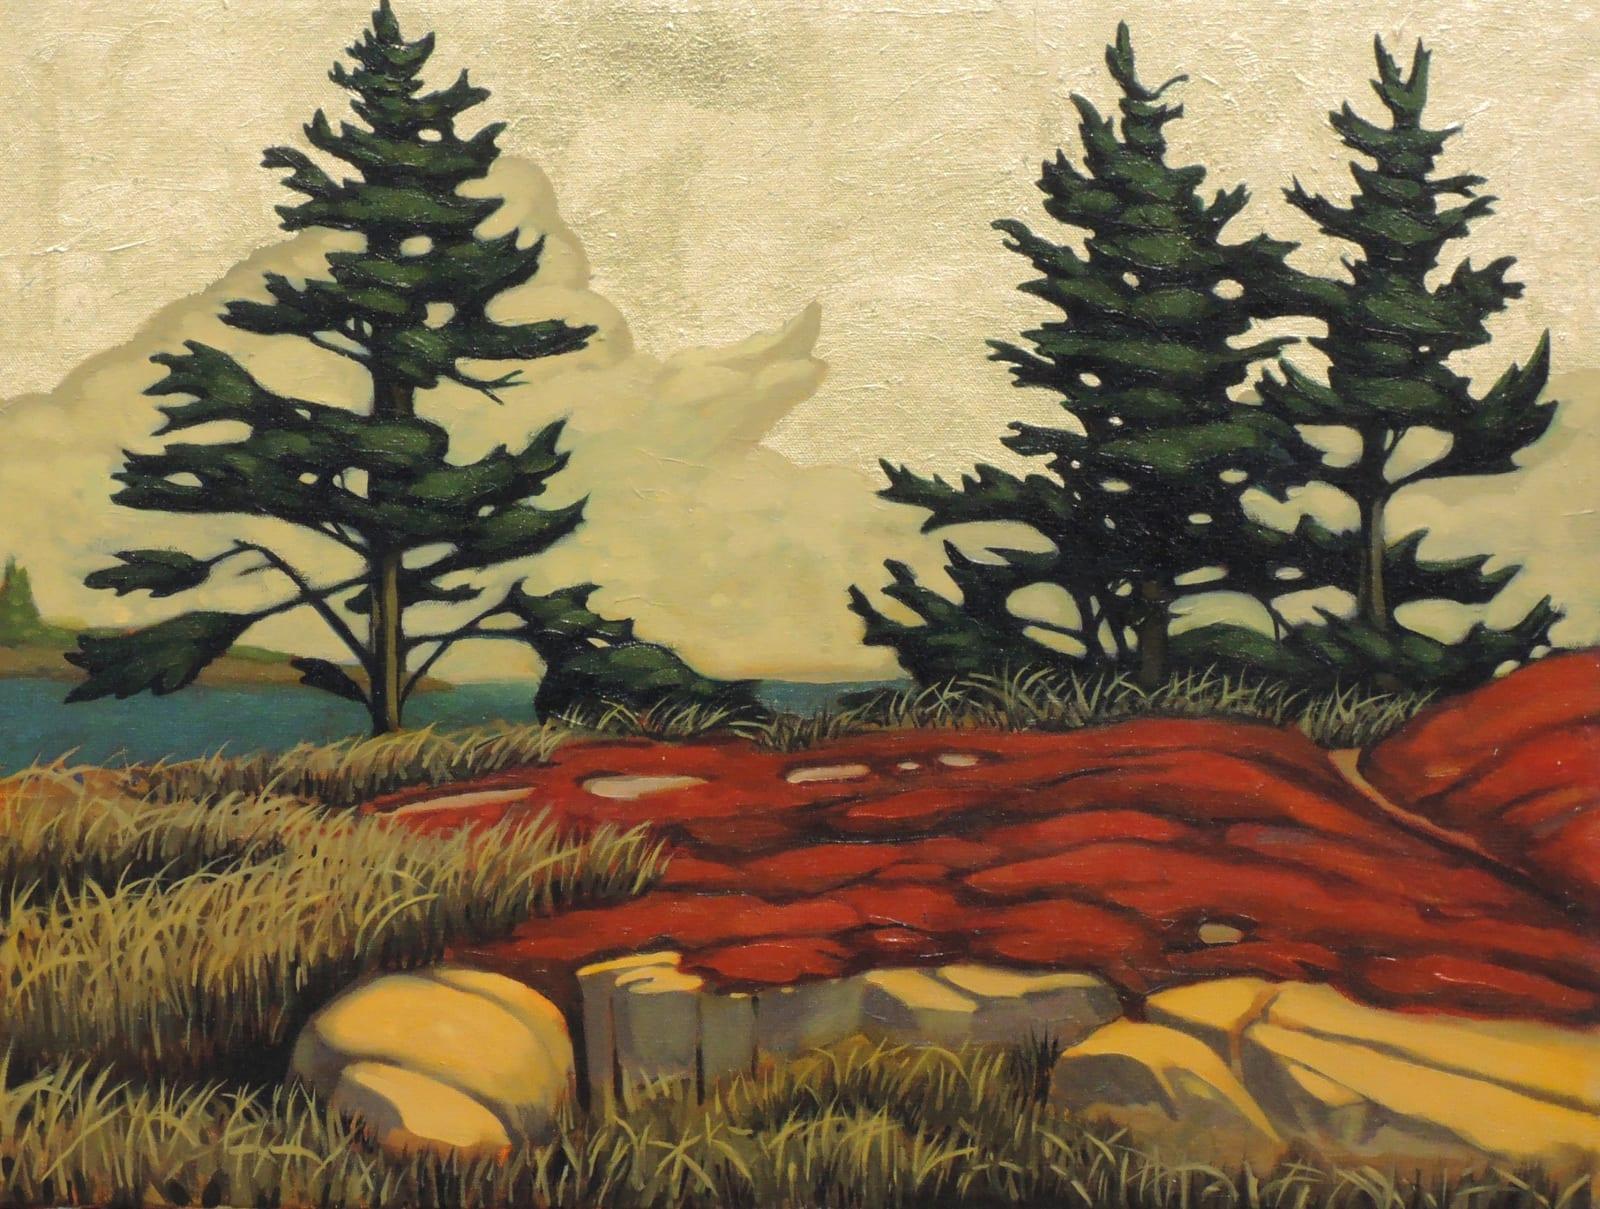 Nathaniel Meyer: Arcardian Shores - Restoration of the Golden Age